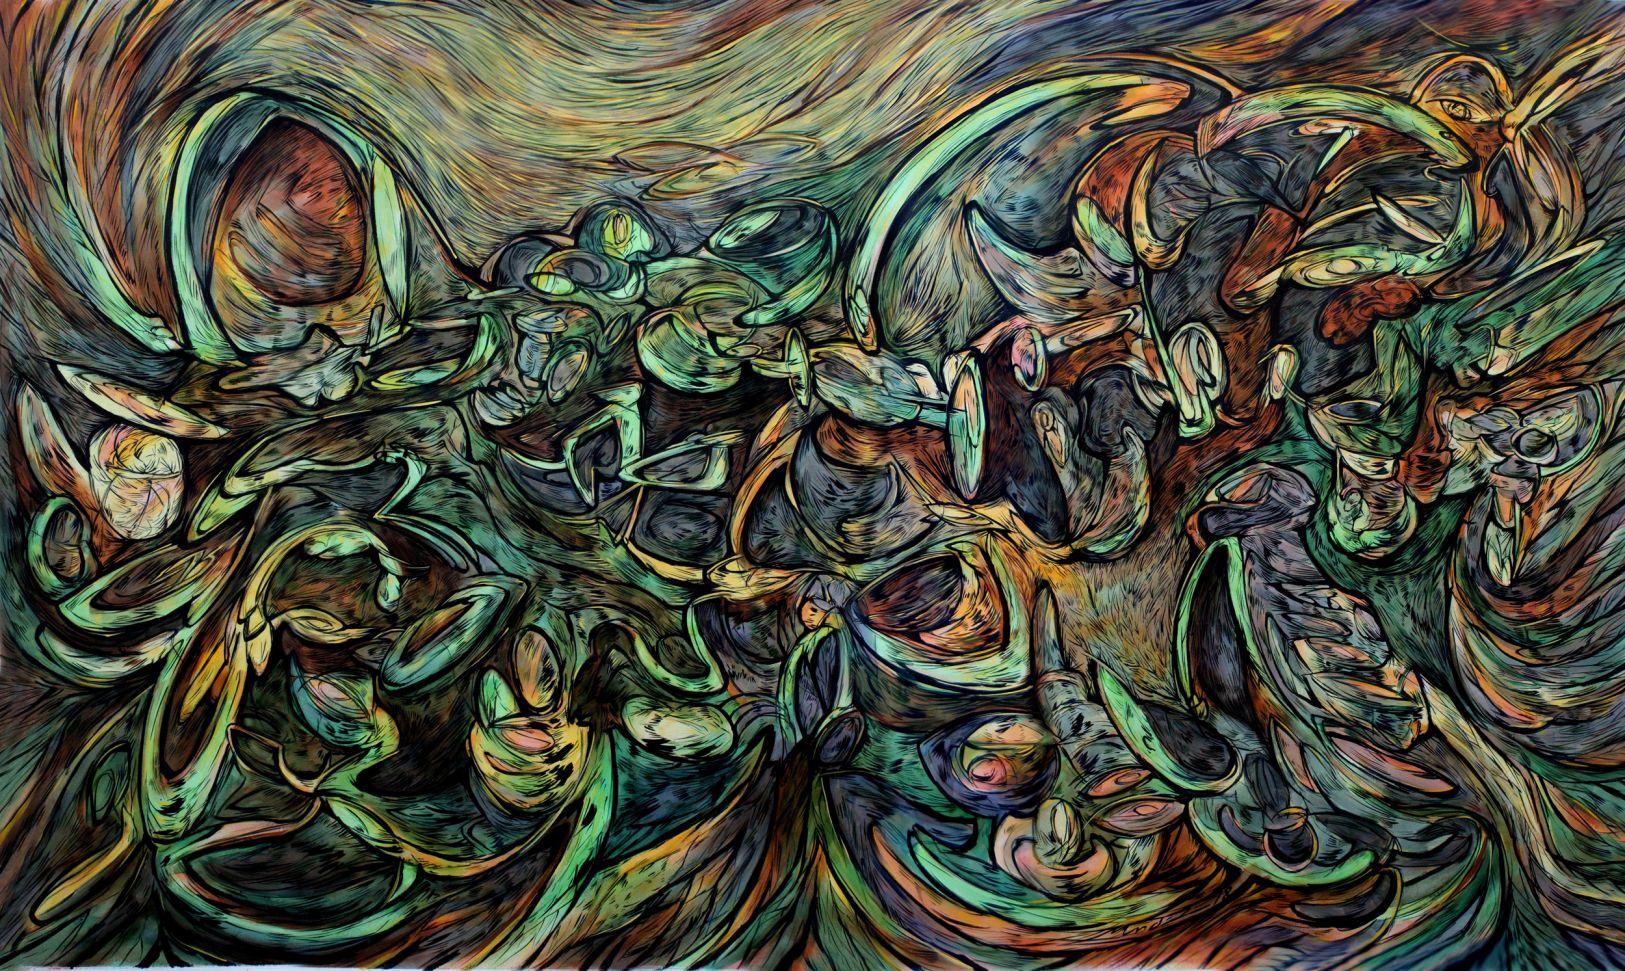 Pintura n°5 (2018) - Alejandro Mendez - Mendez Art